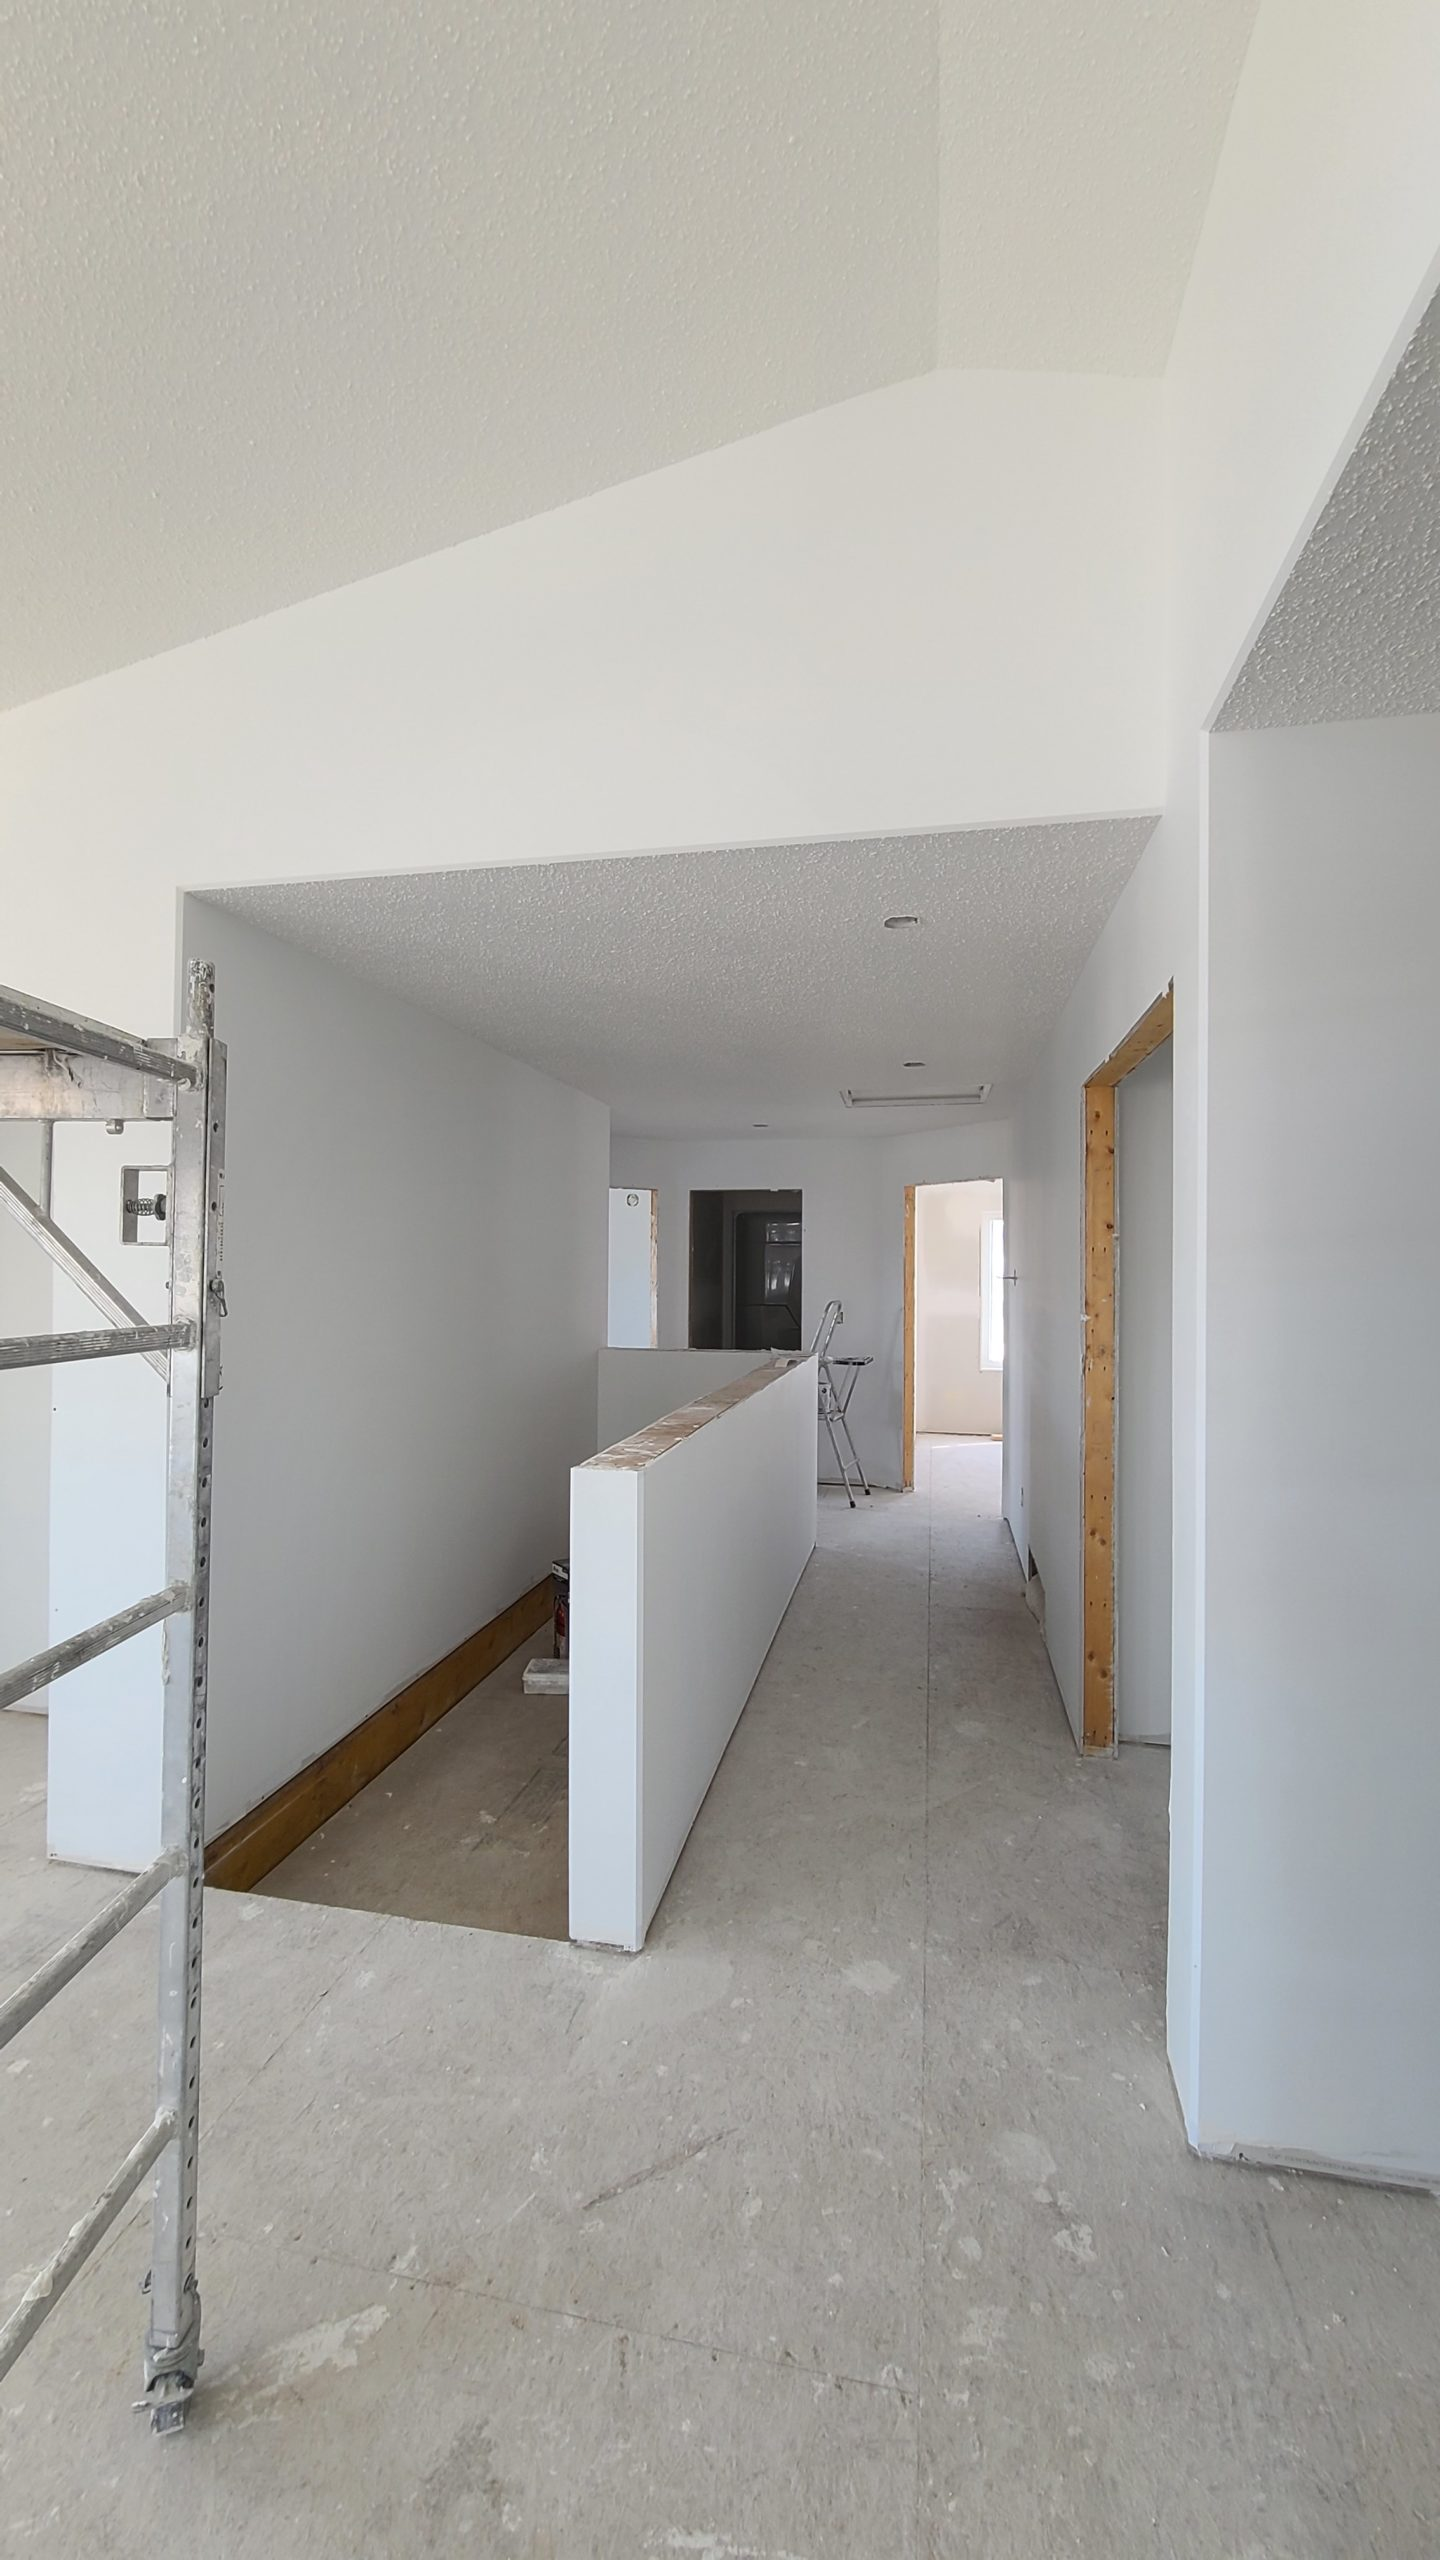 Basement Stairs/Hallway RTM under construction